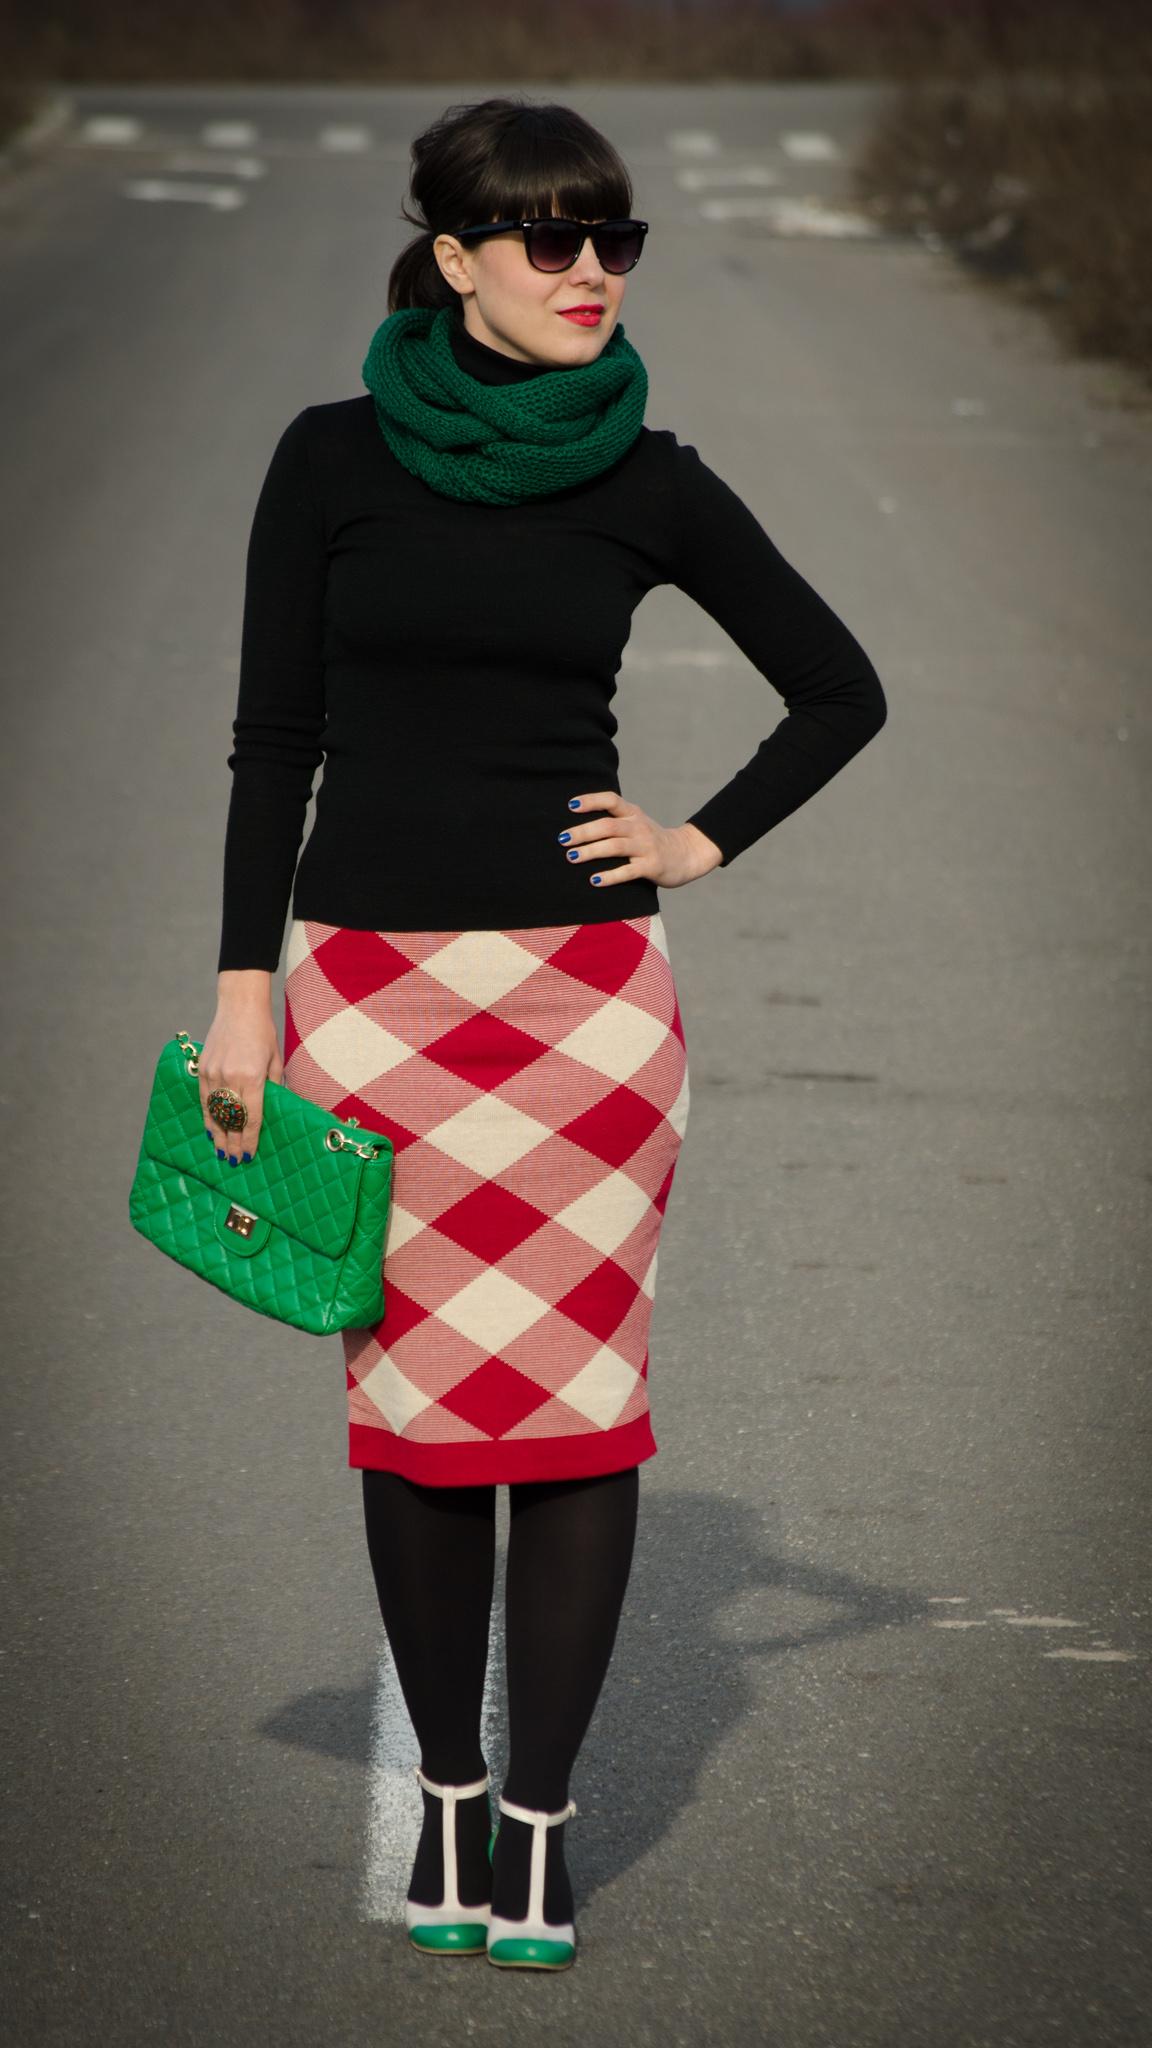 red checkered pencil skirt checkers black turtleneck green scarf bag handbag nude & green high heels tina R koton Christmas look outfit